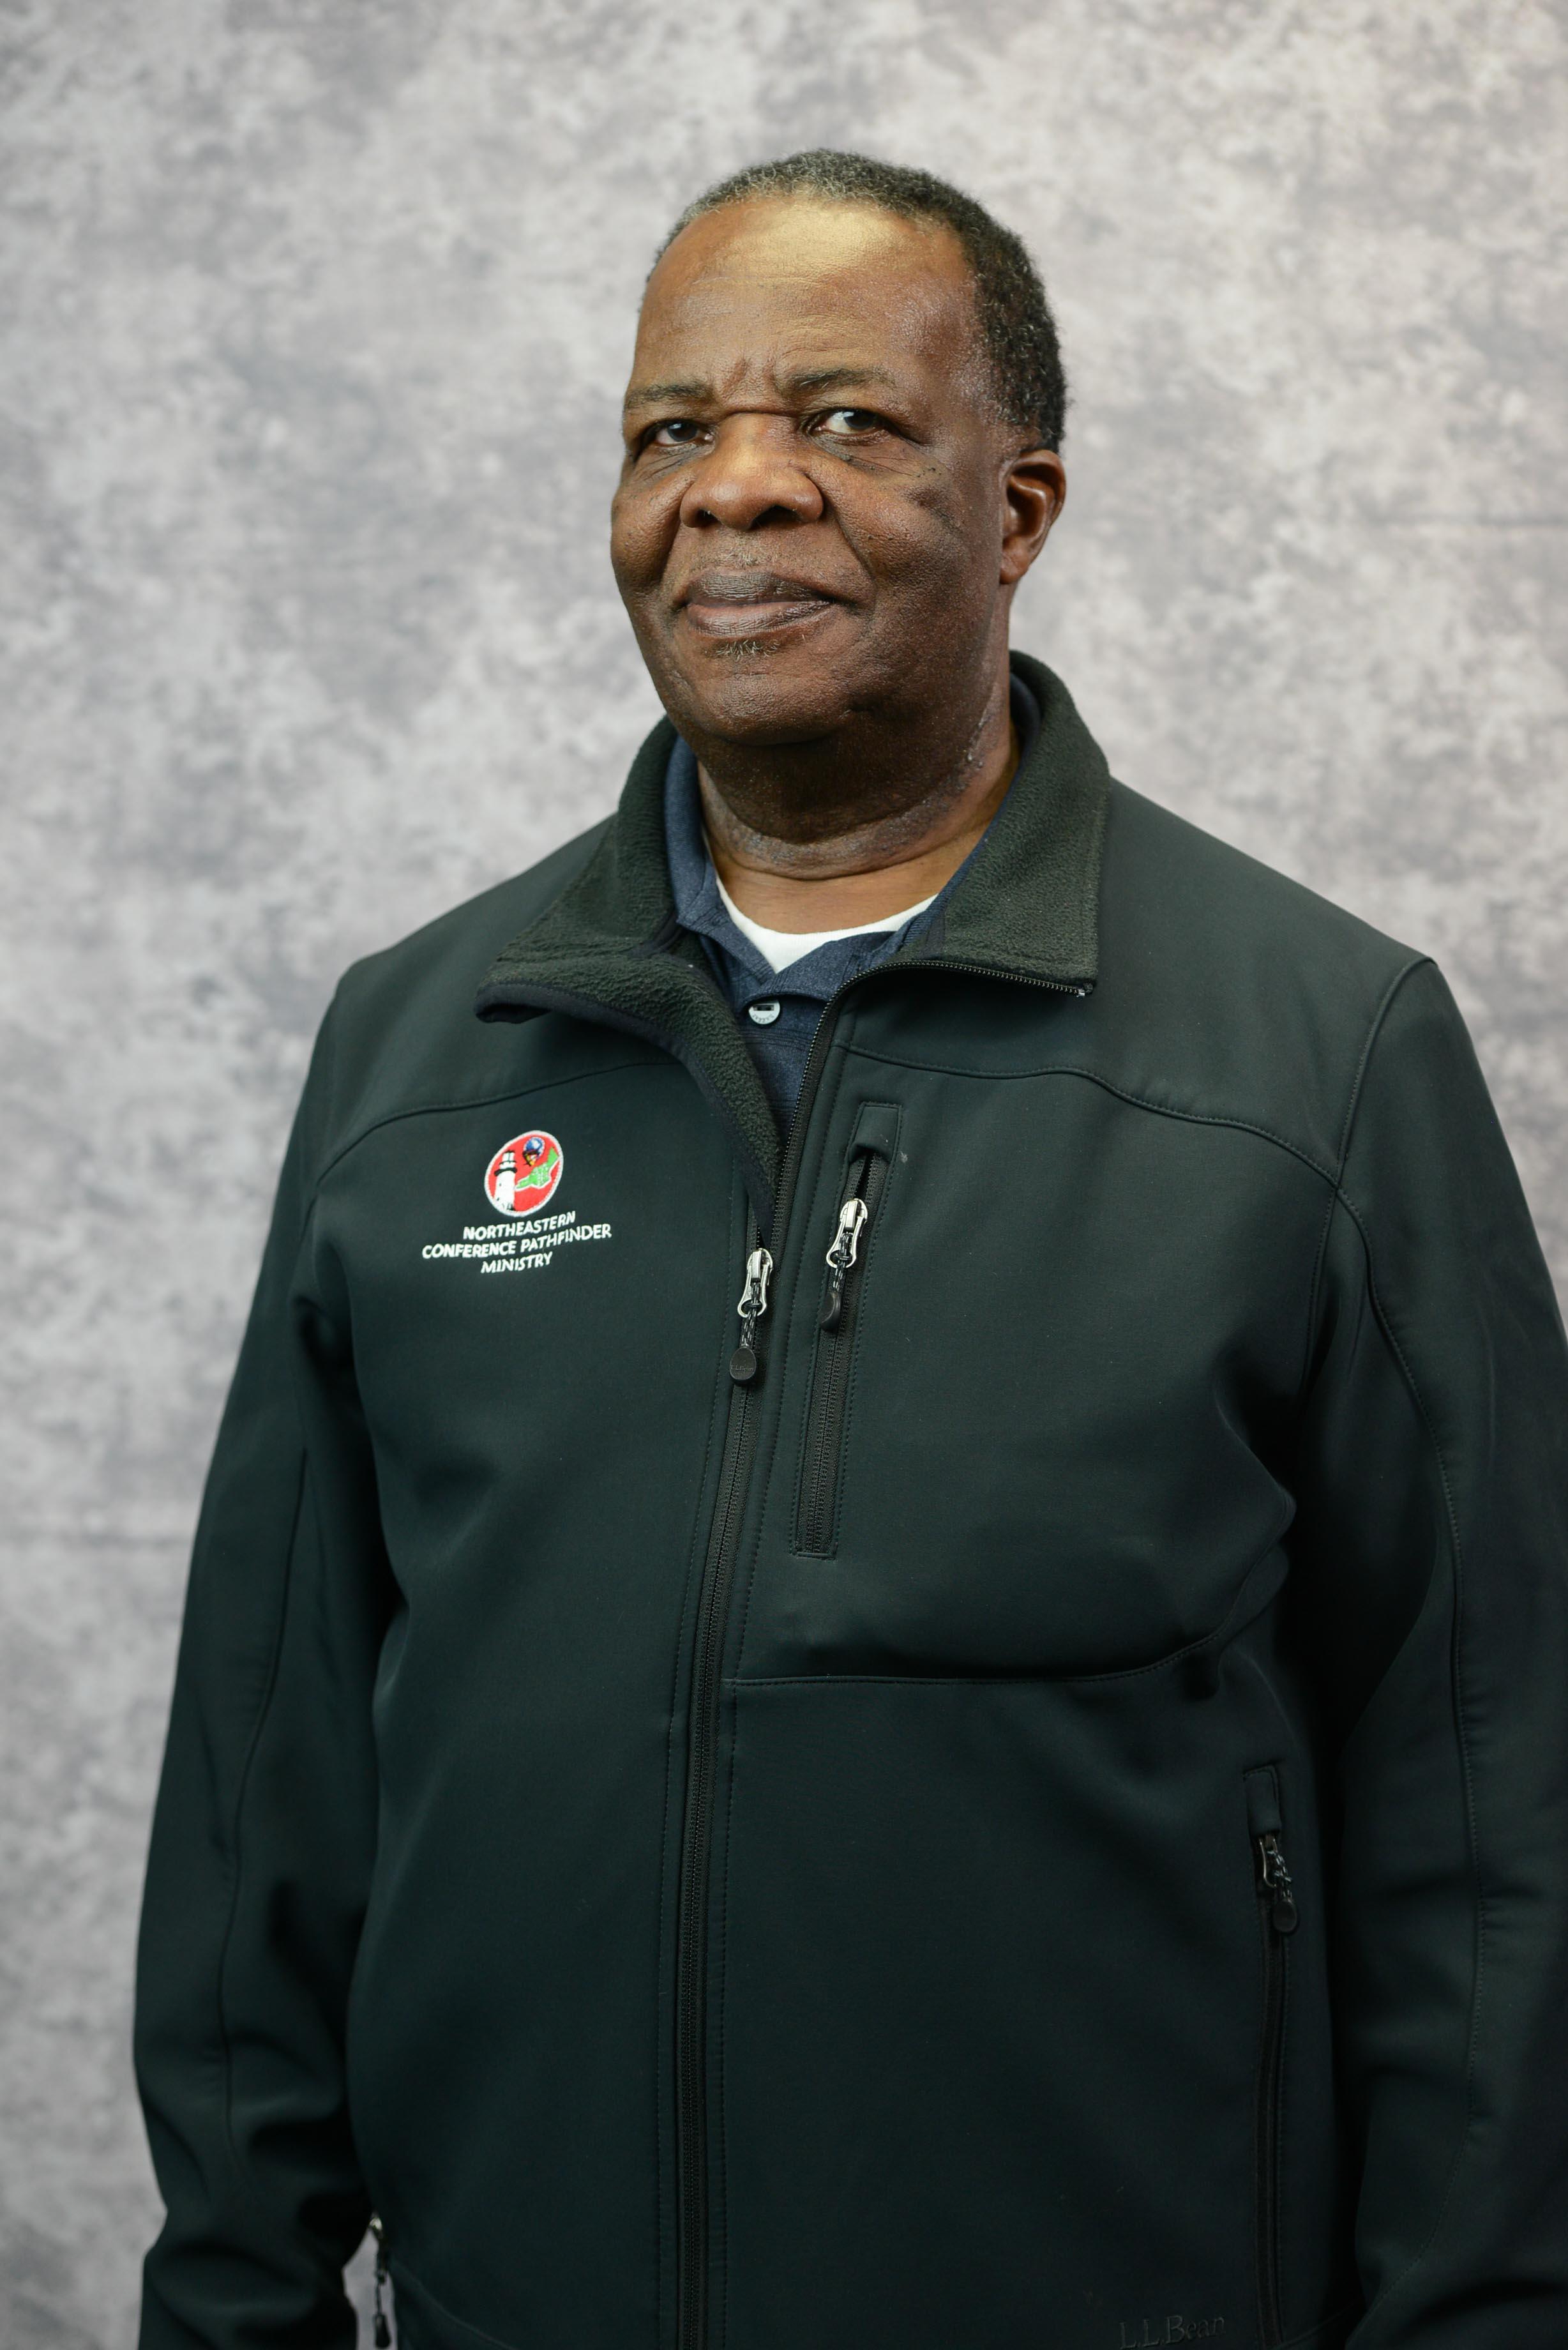 Henry Nelson, Exec. WNY Coordinator